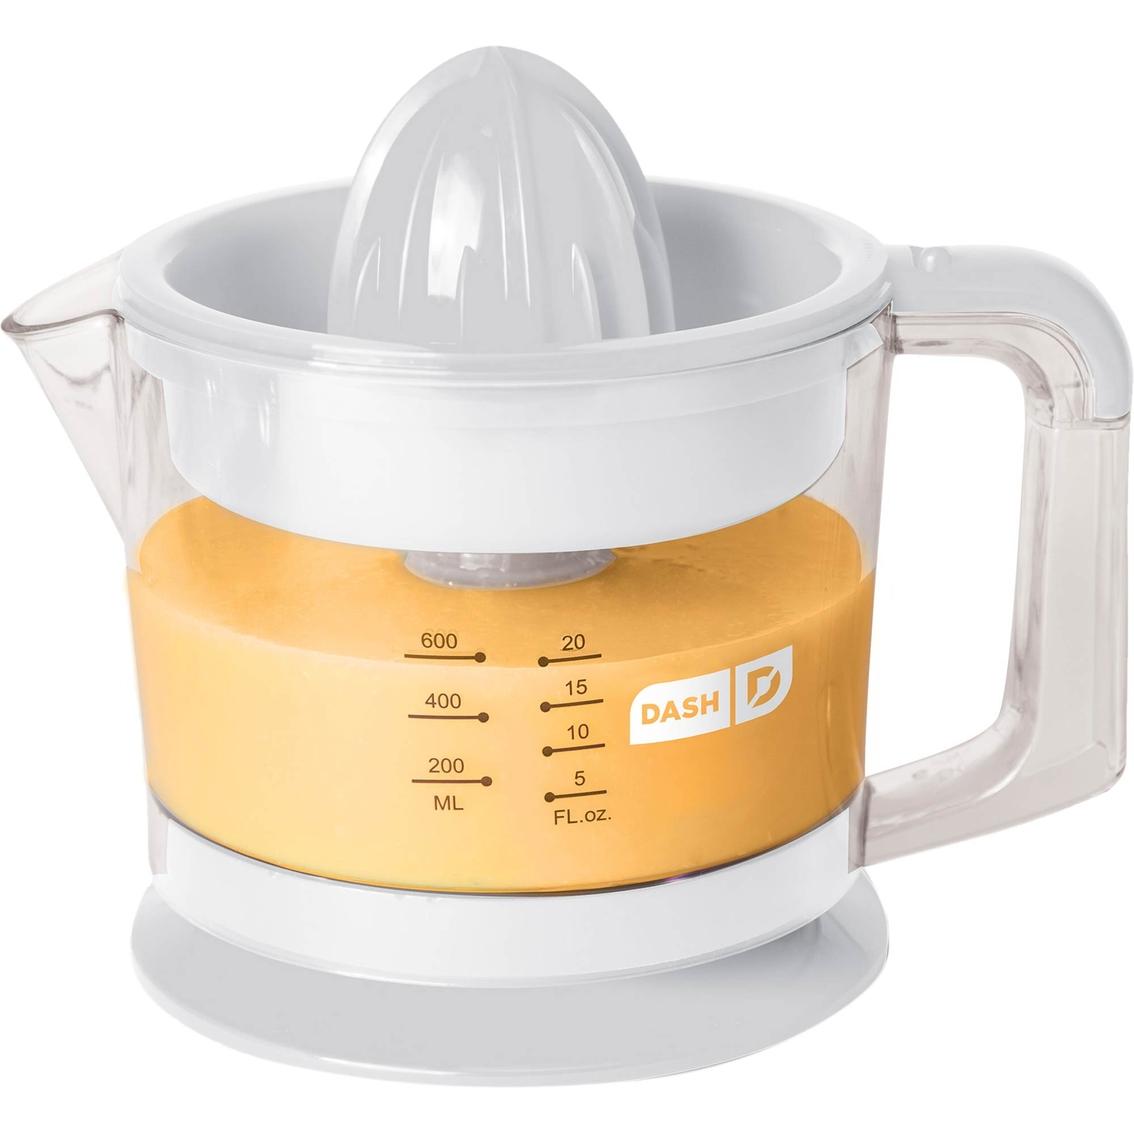 Electric Citrus Reamer ~ Dash go electric qt citrus juicer reamer juicers